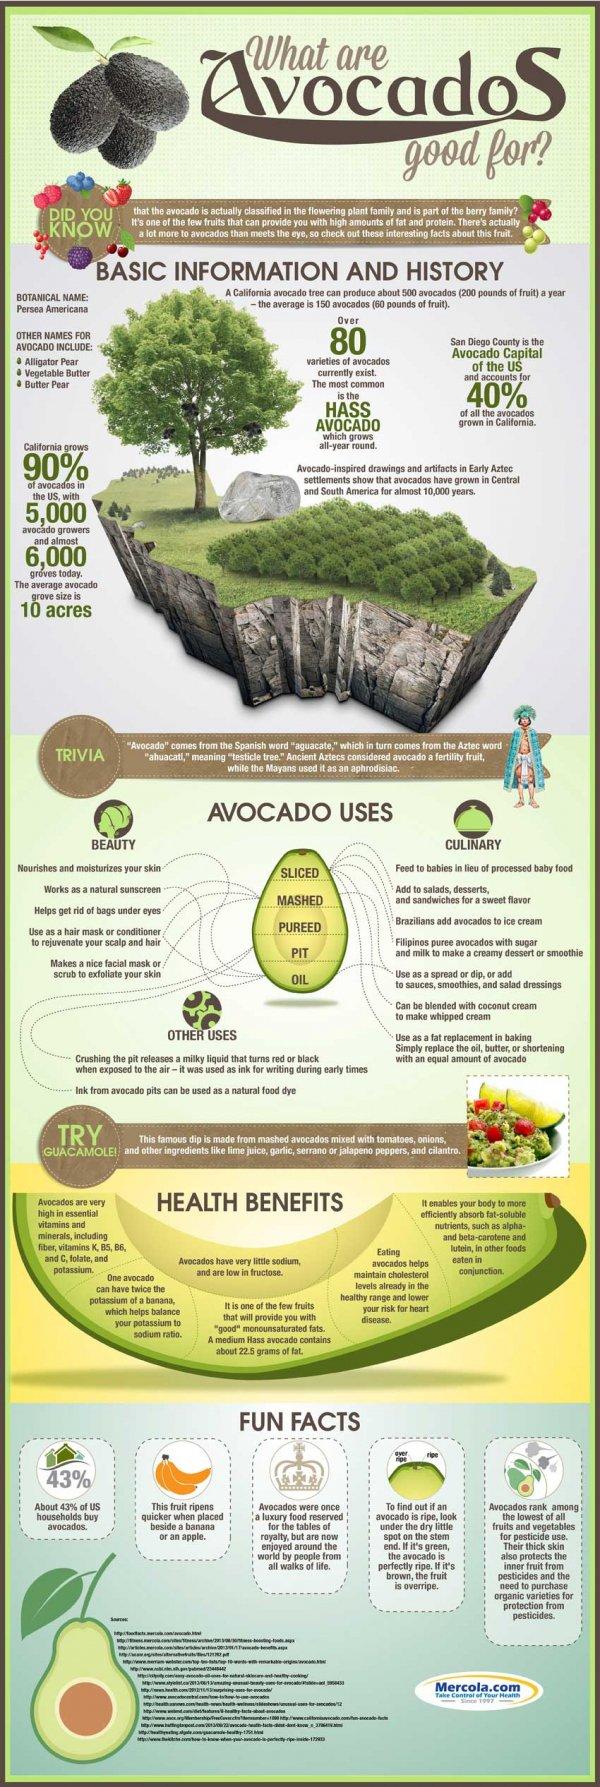 ecosystem,biology,advertising,avhat,are,